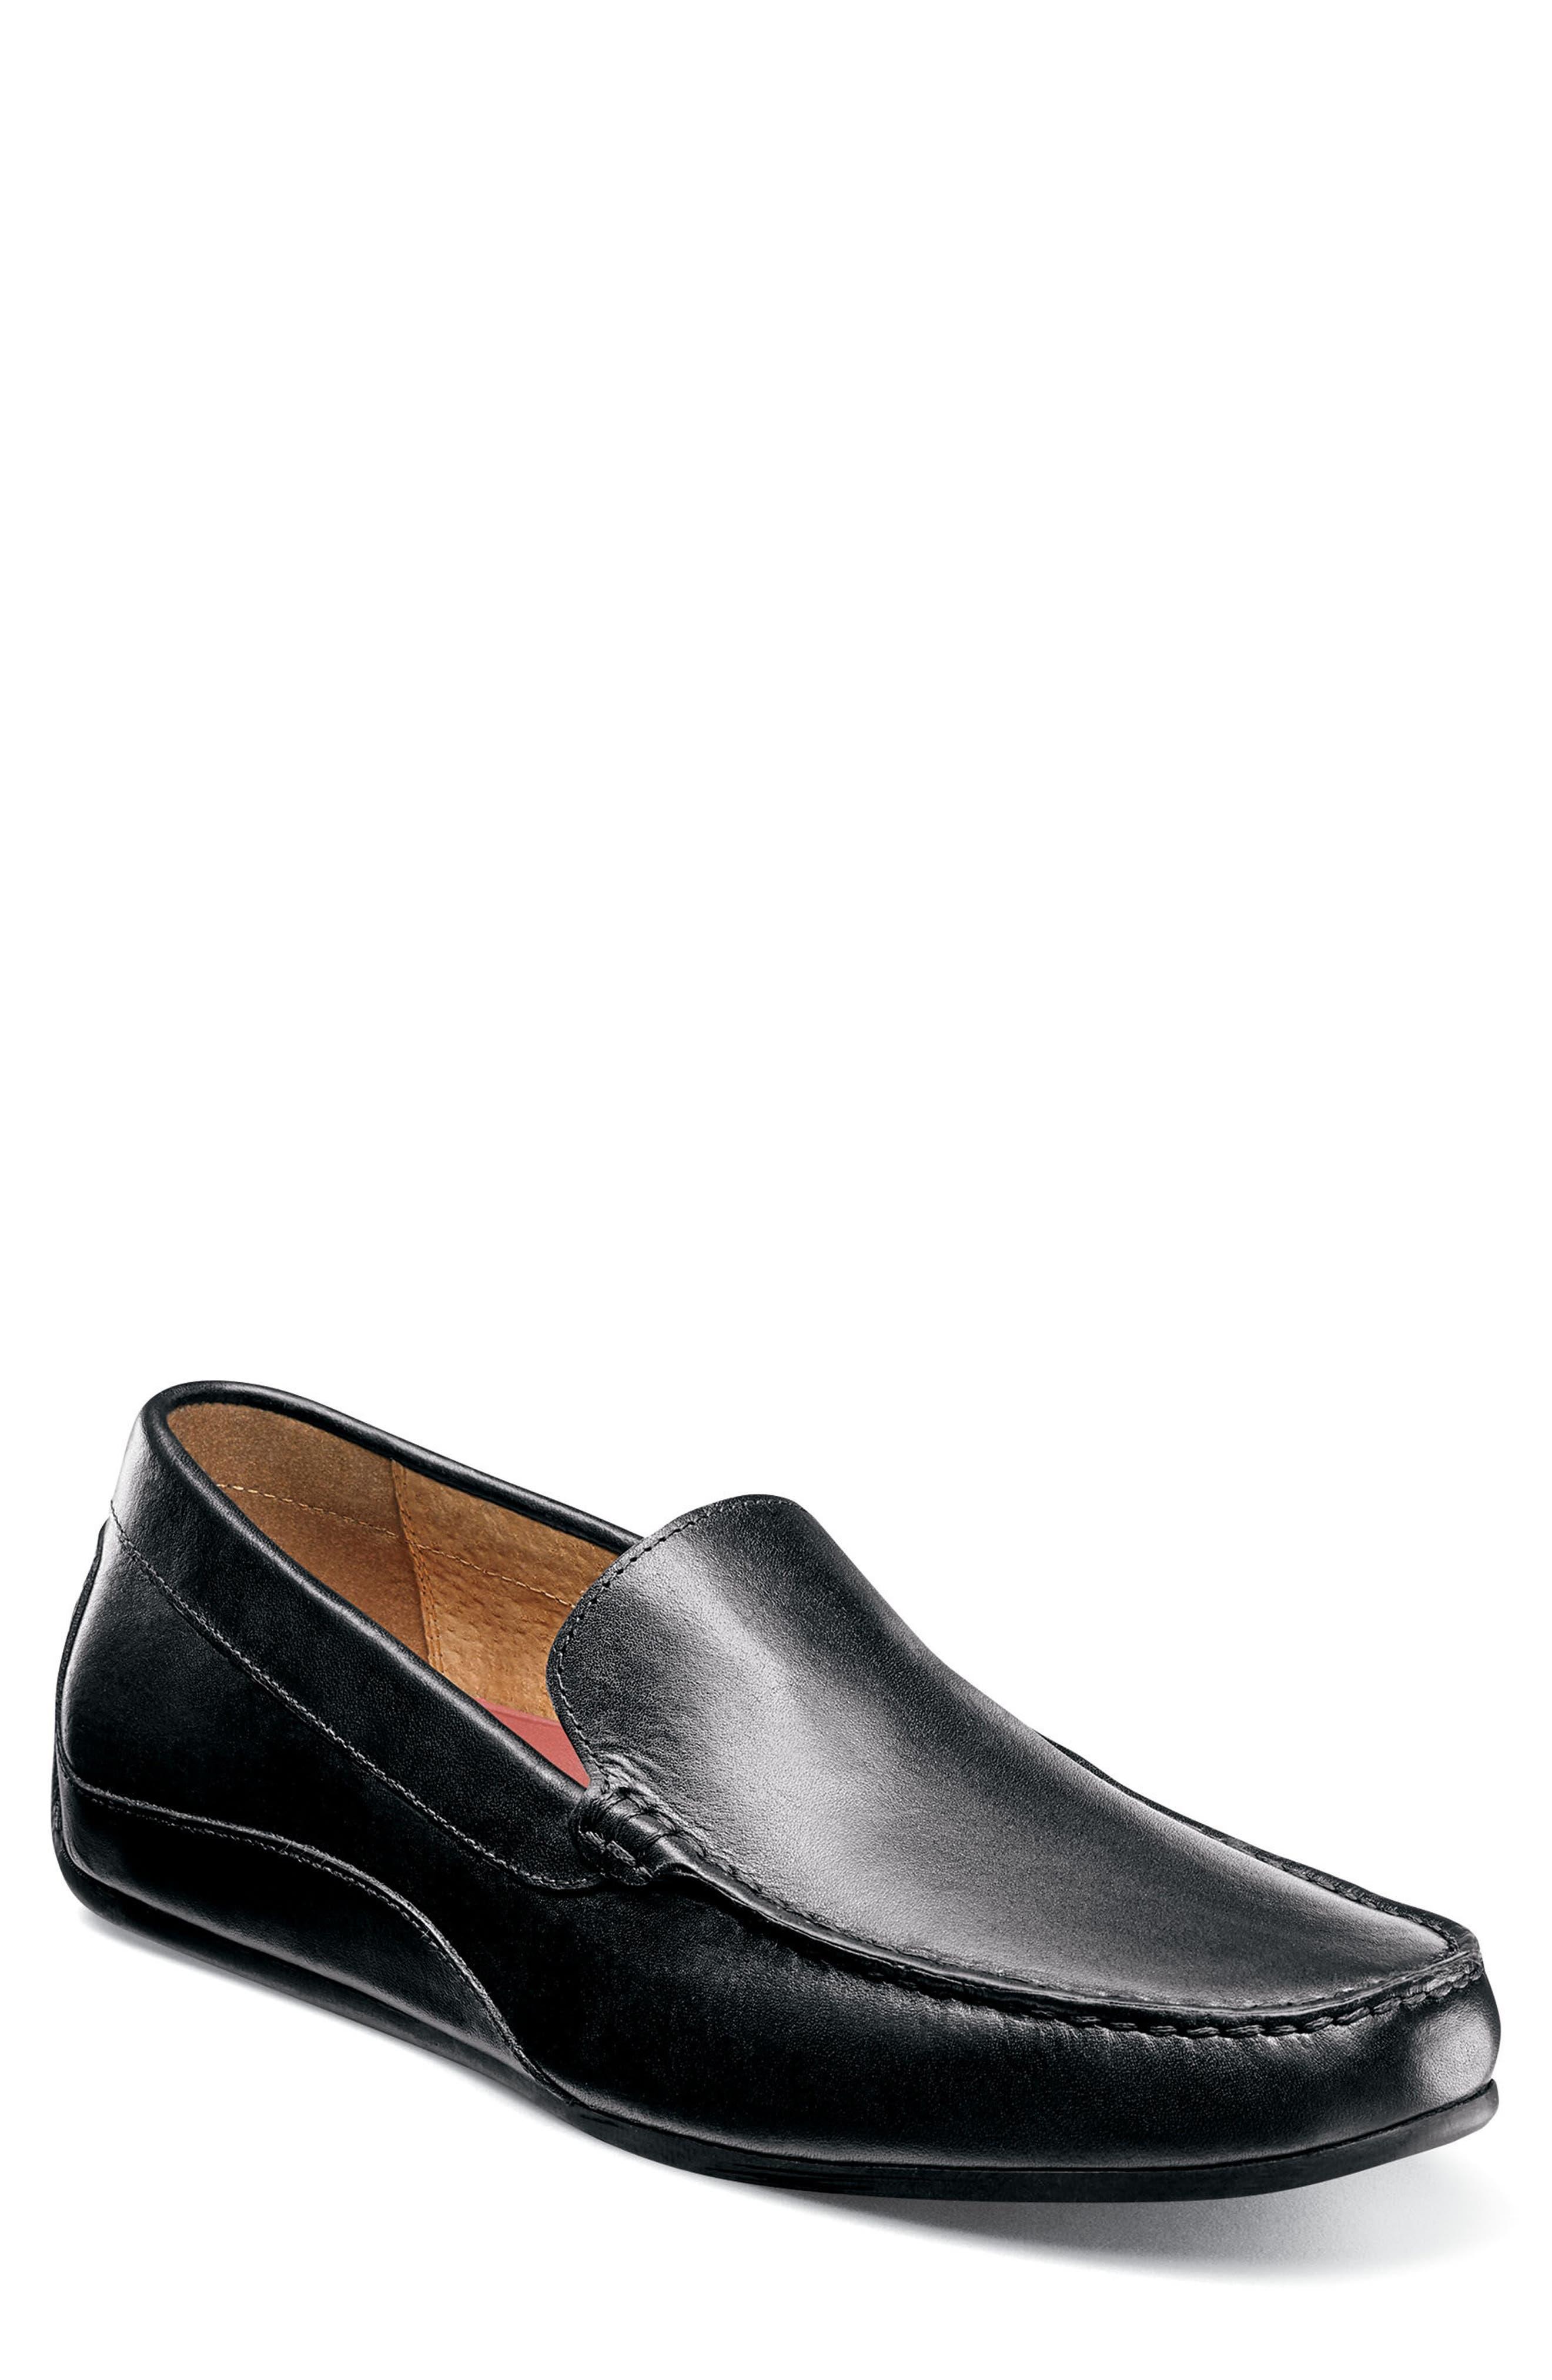 FLORSHEIM, Oval Driving Shoe, Main thumbnail 1, color, BLACK LEATHER